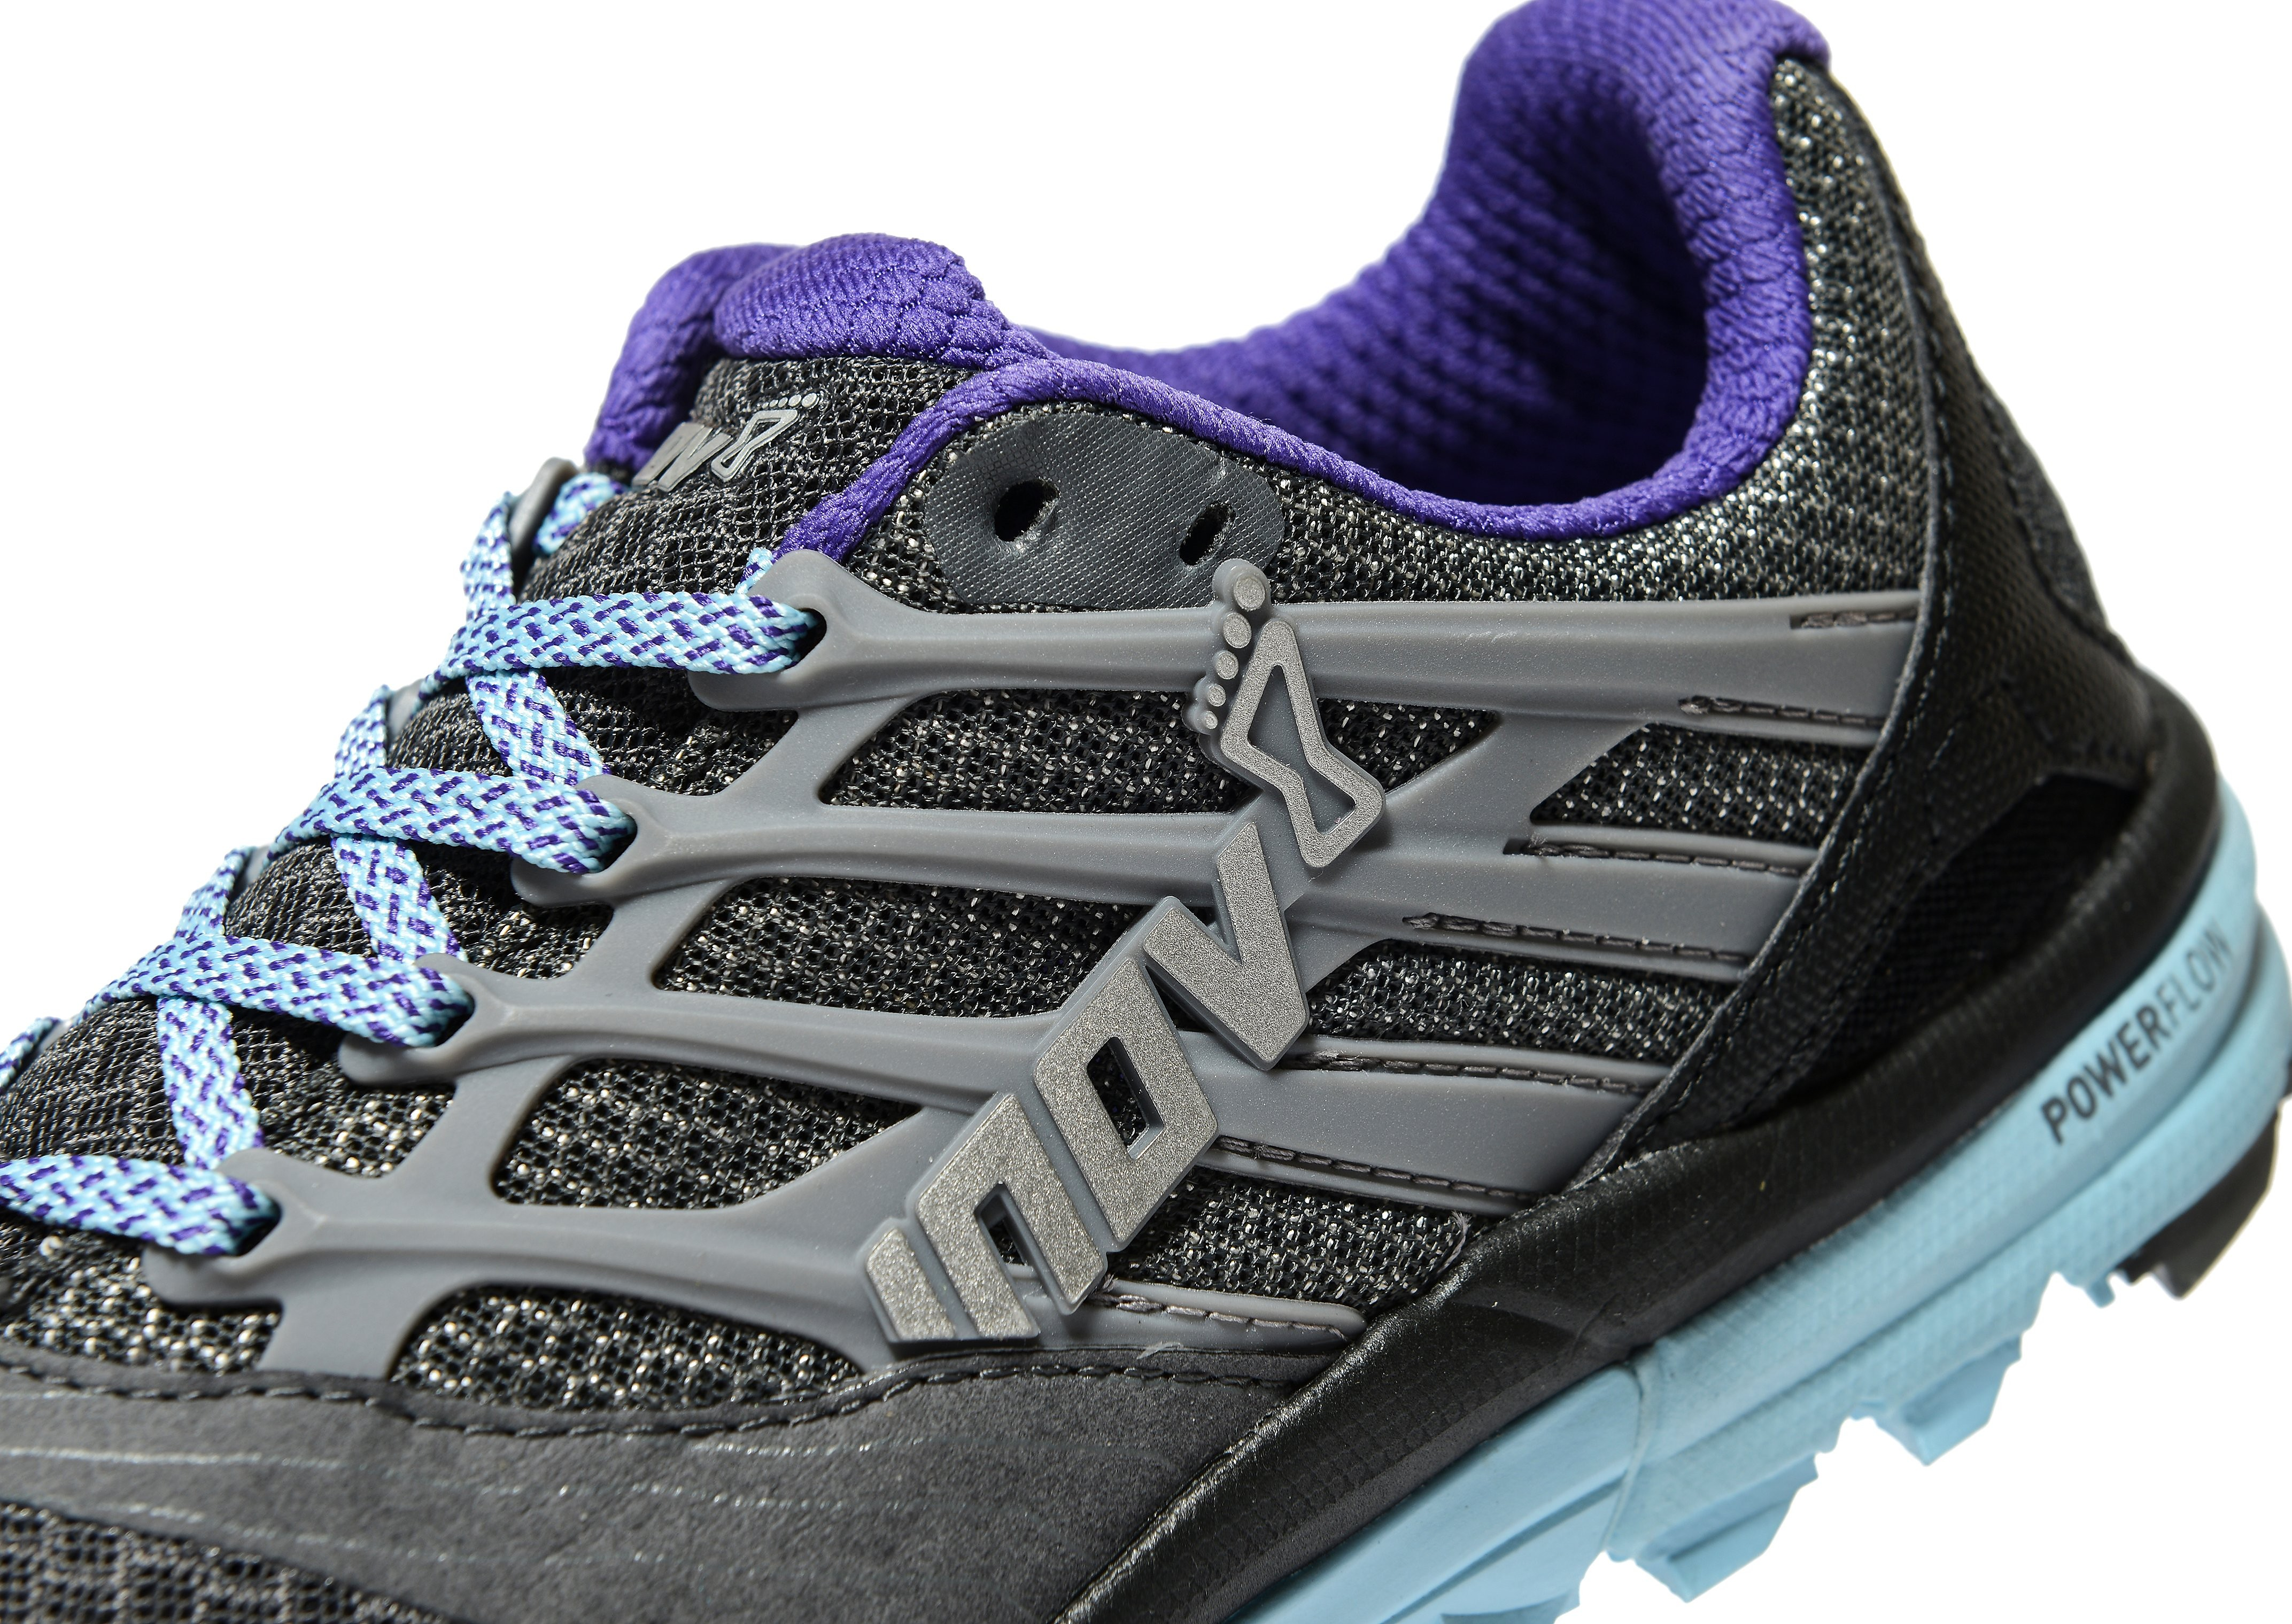 Inov-8 TrialTalon 275 Running Shoes Women's